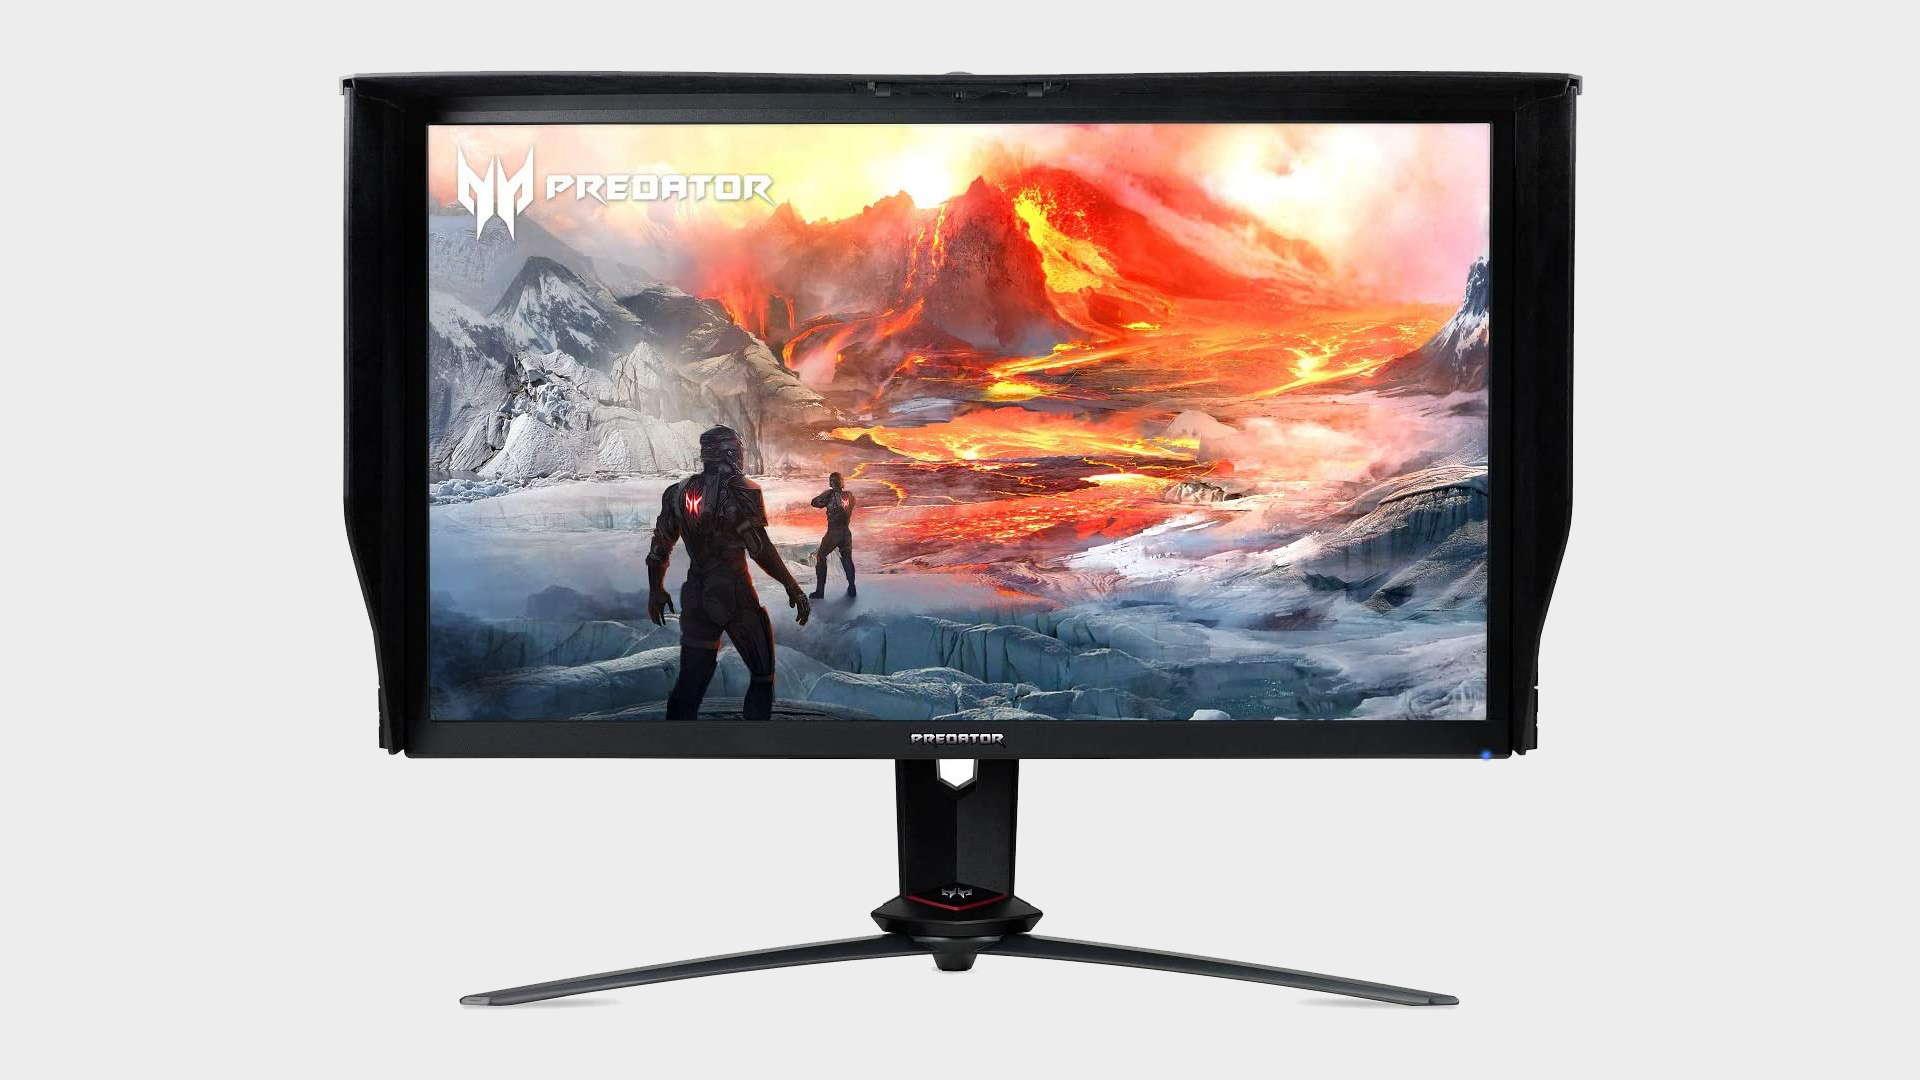 Acer Predator XB273K high refresh rate gaming monitor